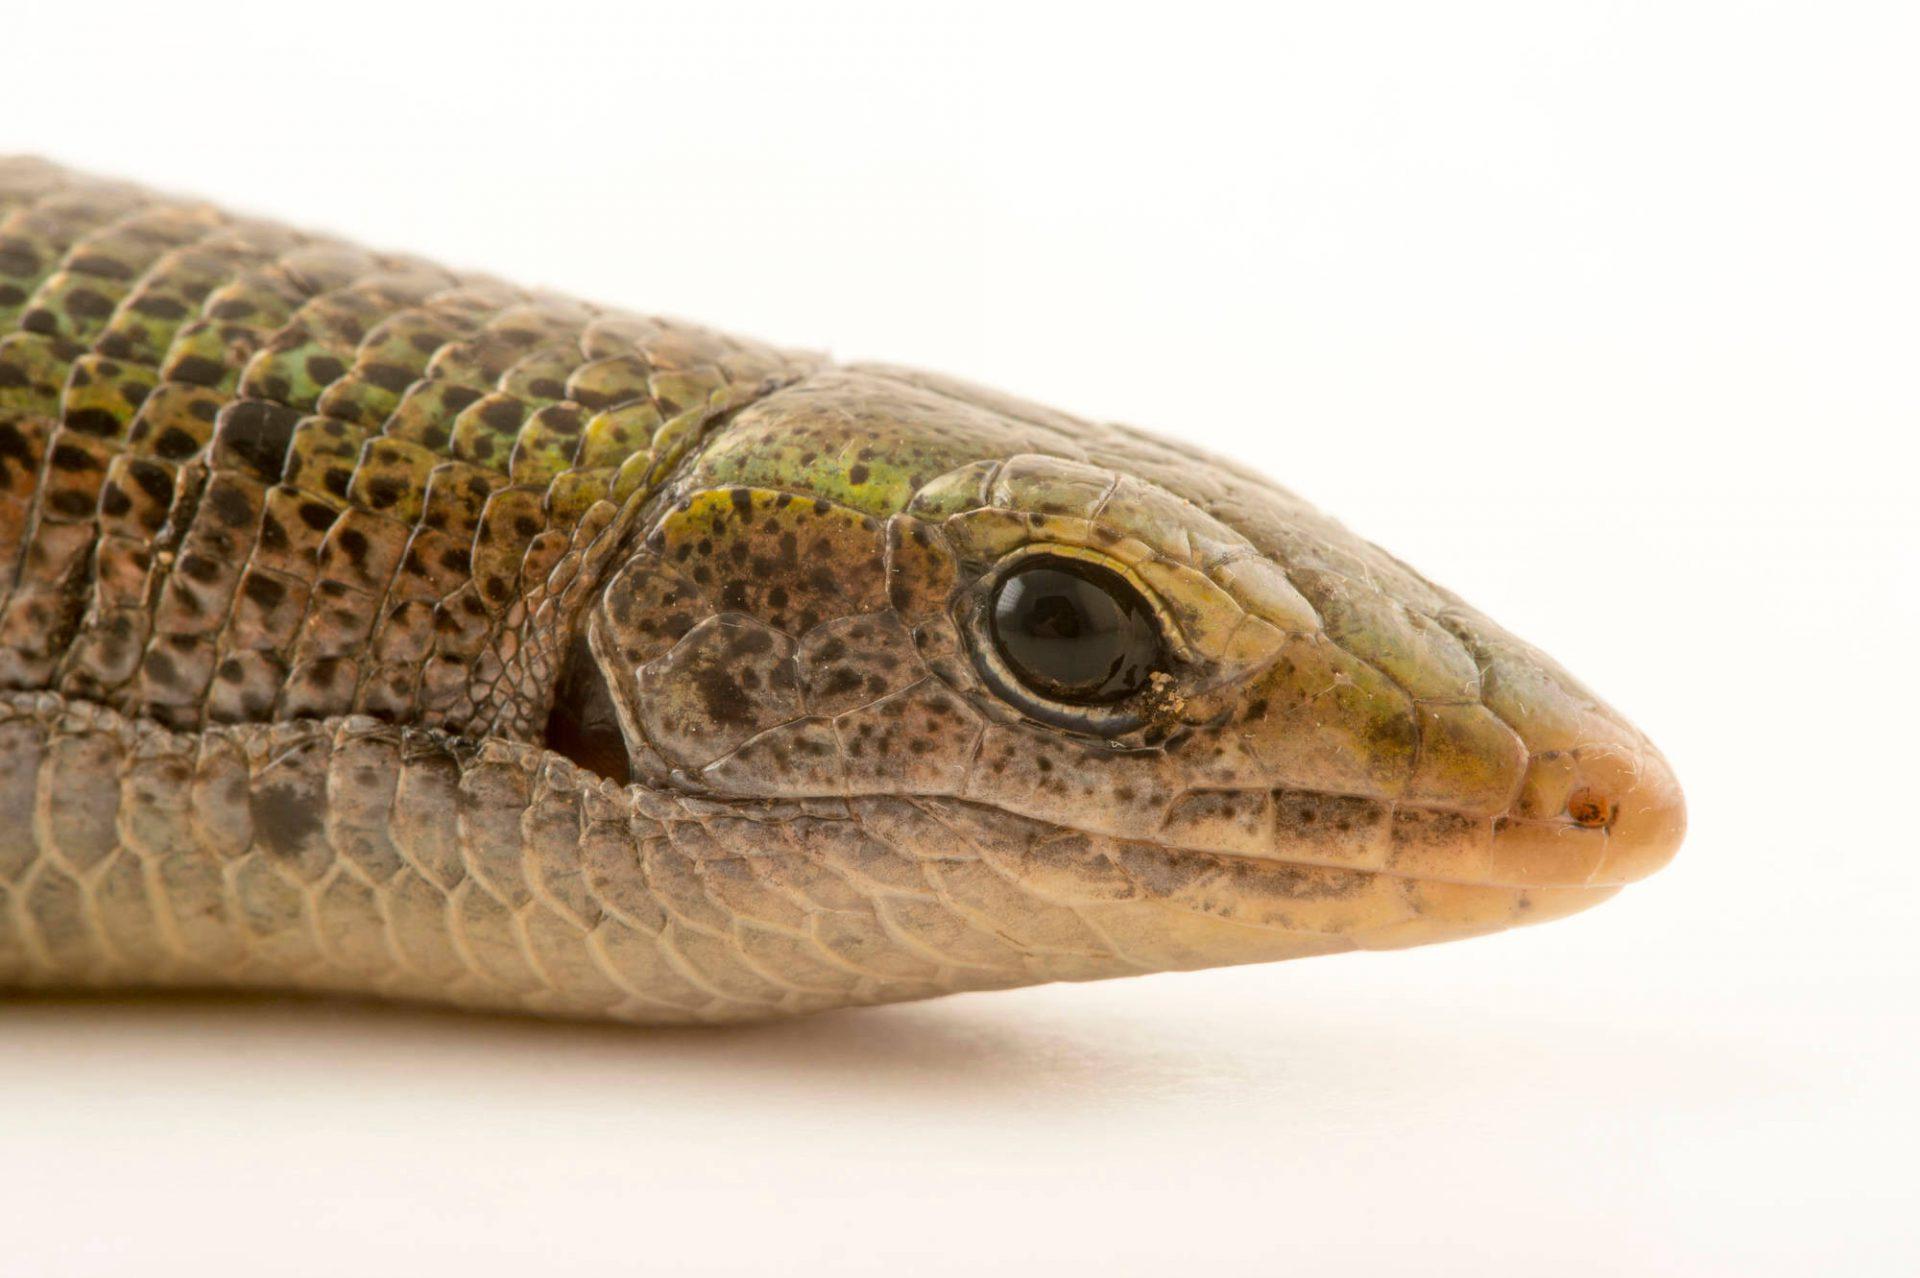 Photo: A green Madagascar girdled lizard, Zonosaurus haraldmeieri, at the Plzen Zoo.